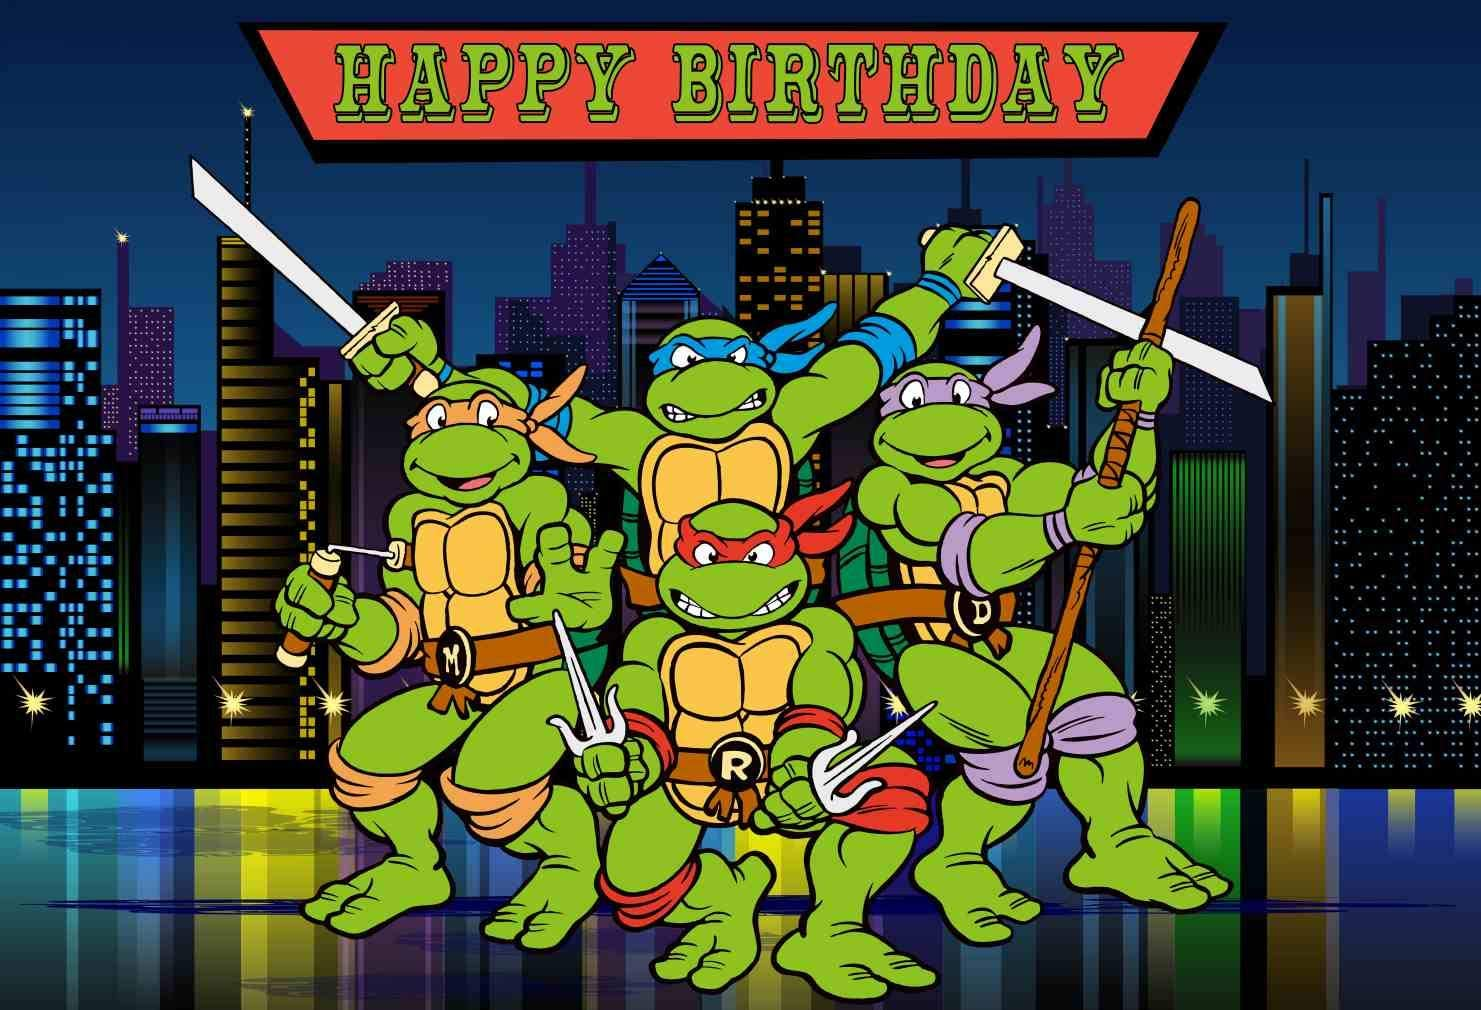 Teenage Mutant Ninja Turtles Birthday Party Backdrop Boys Kids Happy Birthday Banner Cartoon Movie Background for Photography 7x5 ft 29